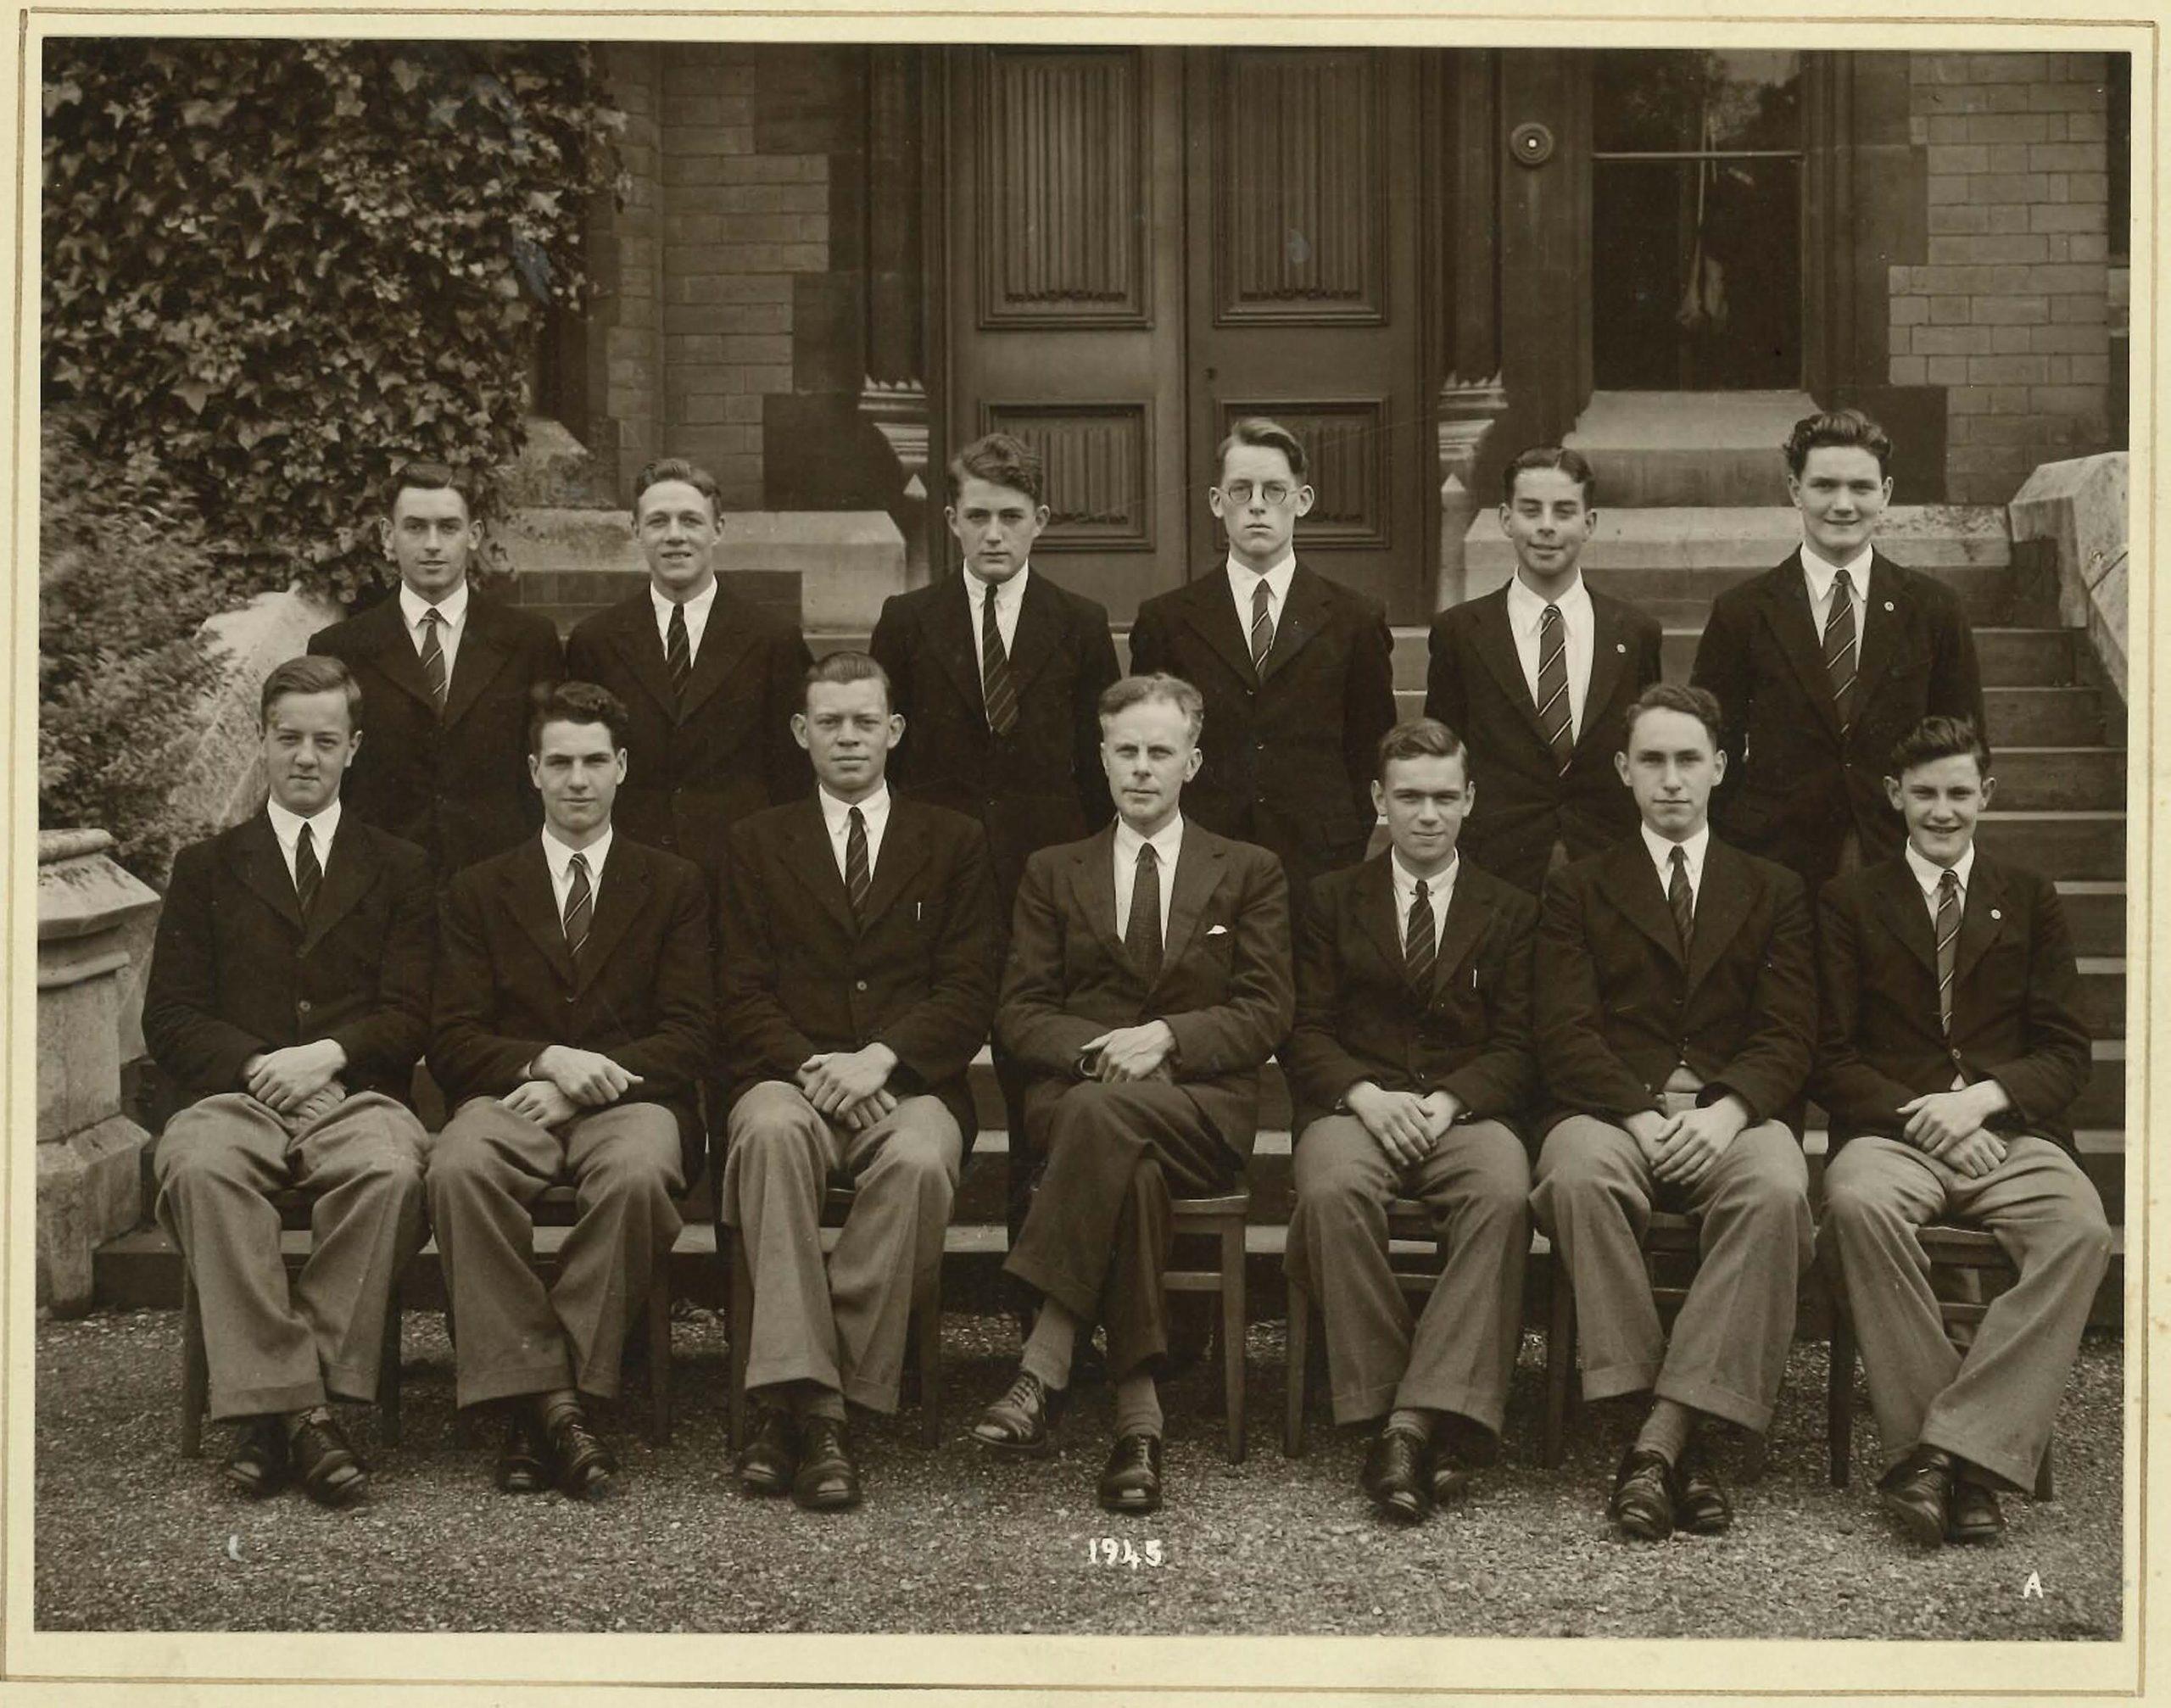 Warren Derry Headmaster with students in 1945